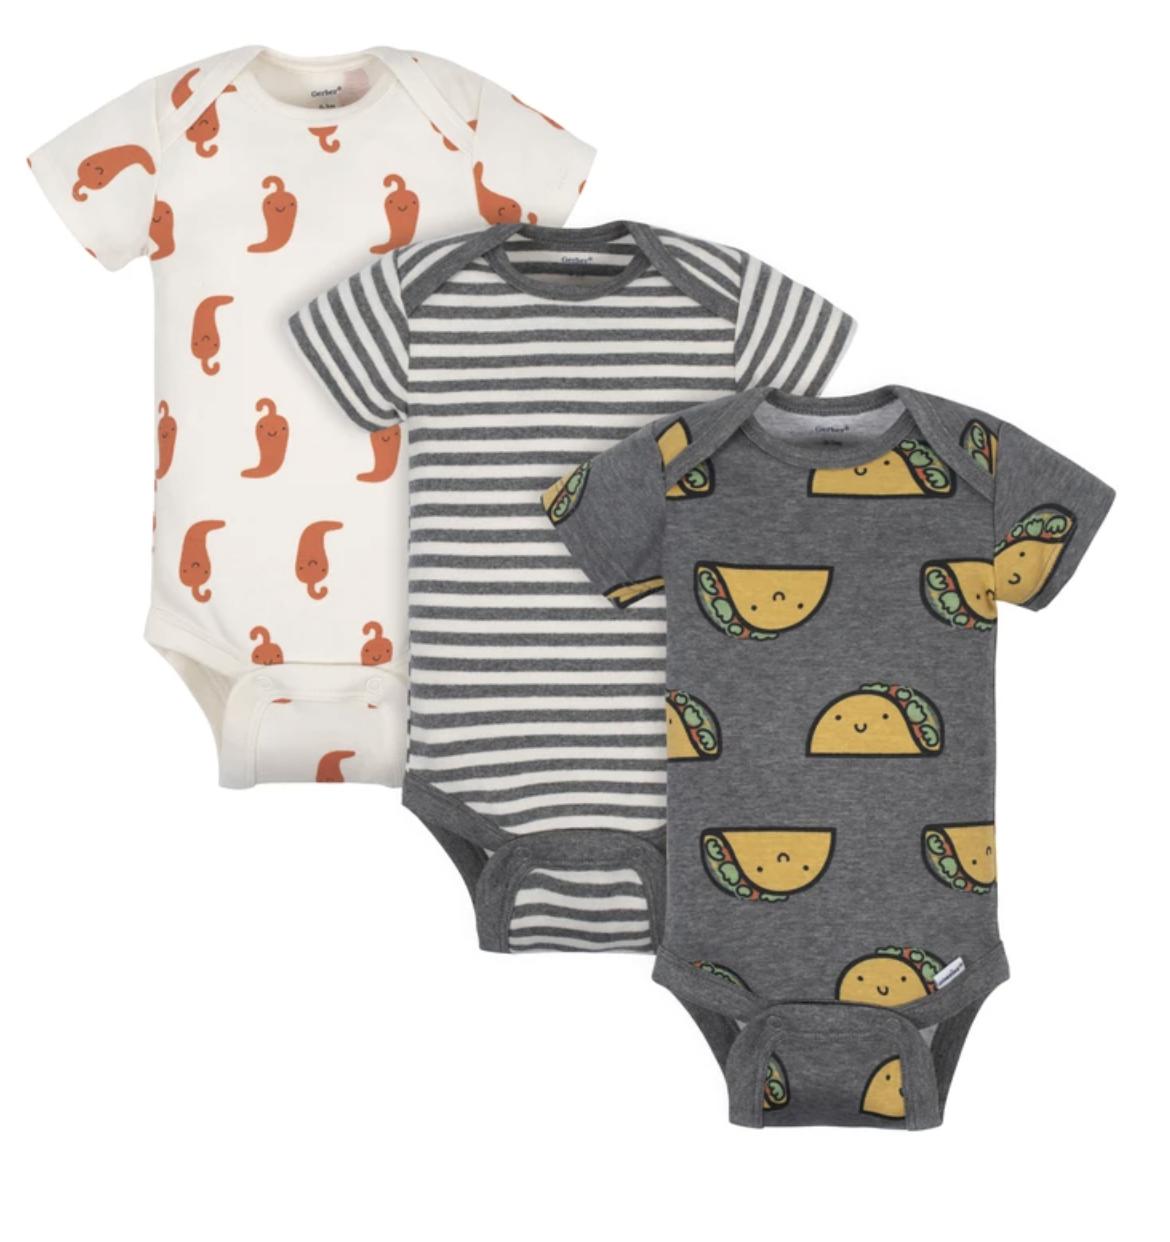 Gerber® 7-Pack Baby Taco Short Sleeve Onesies Bodysuits - Limited